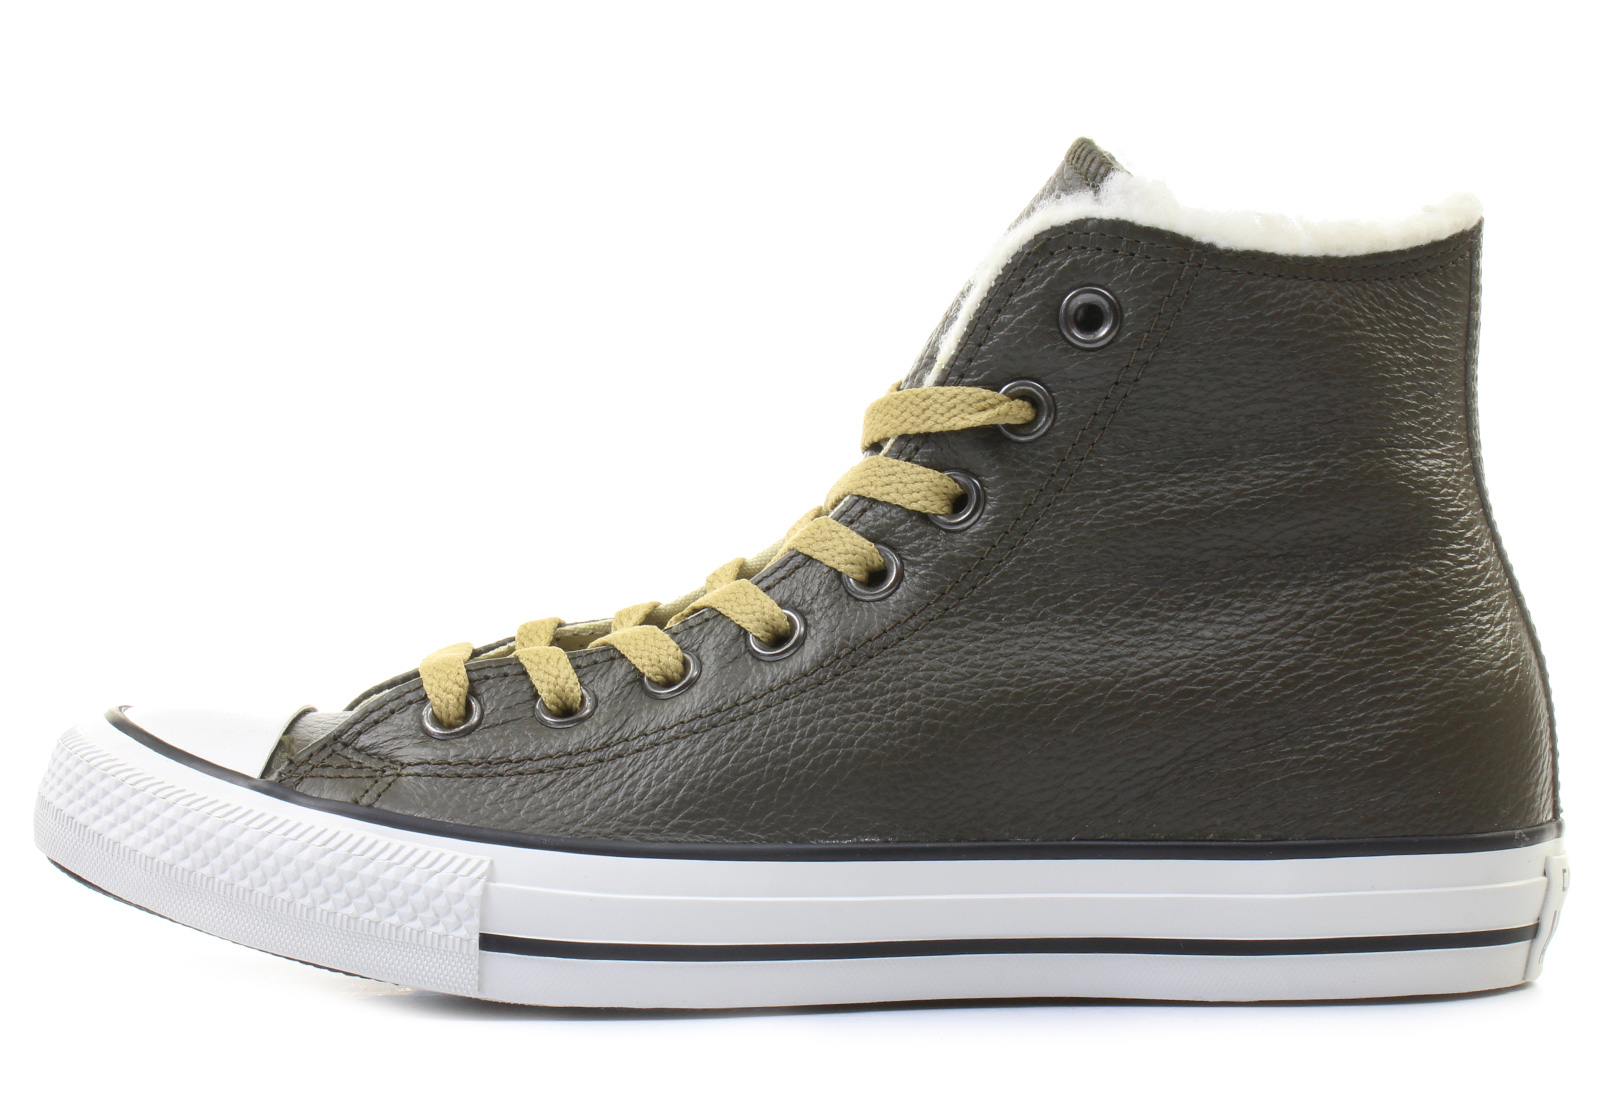 9a7ec341752 Converse Sneakers - Chuck Taylor All Star Leather Fur Hi - 144728C ...